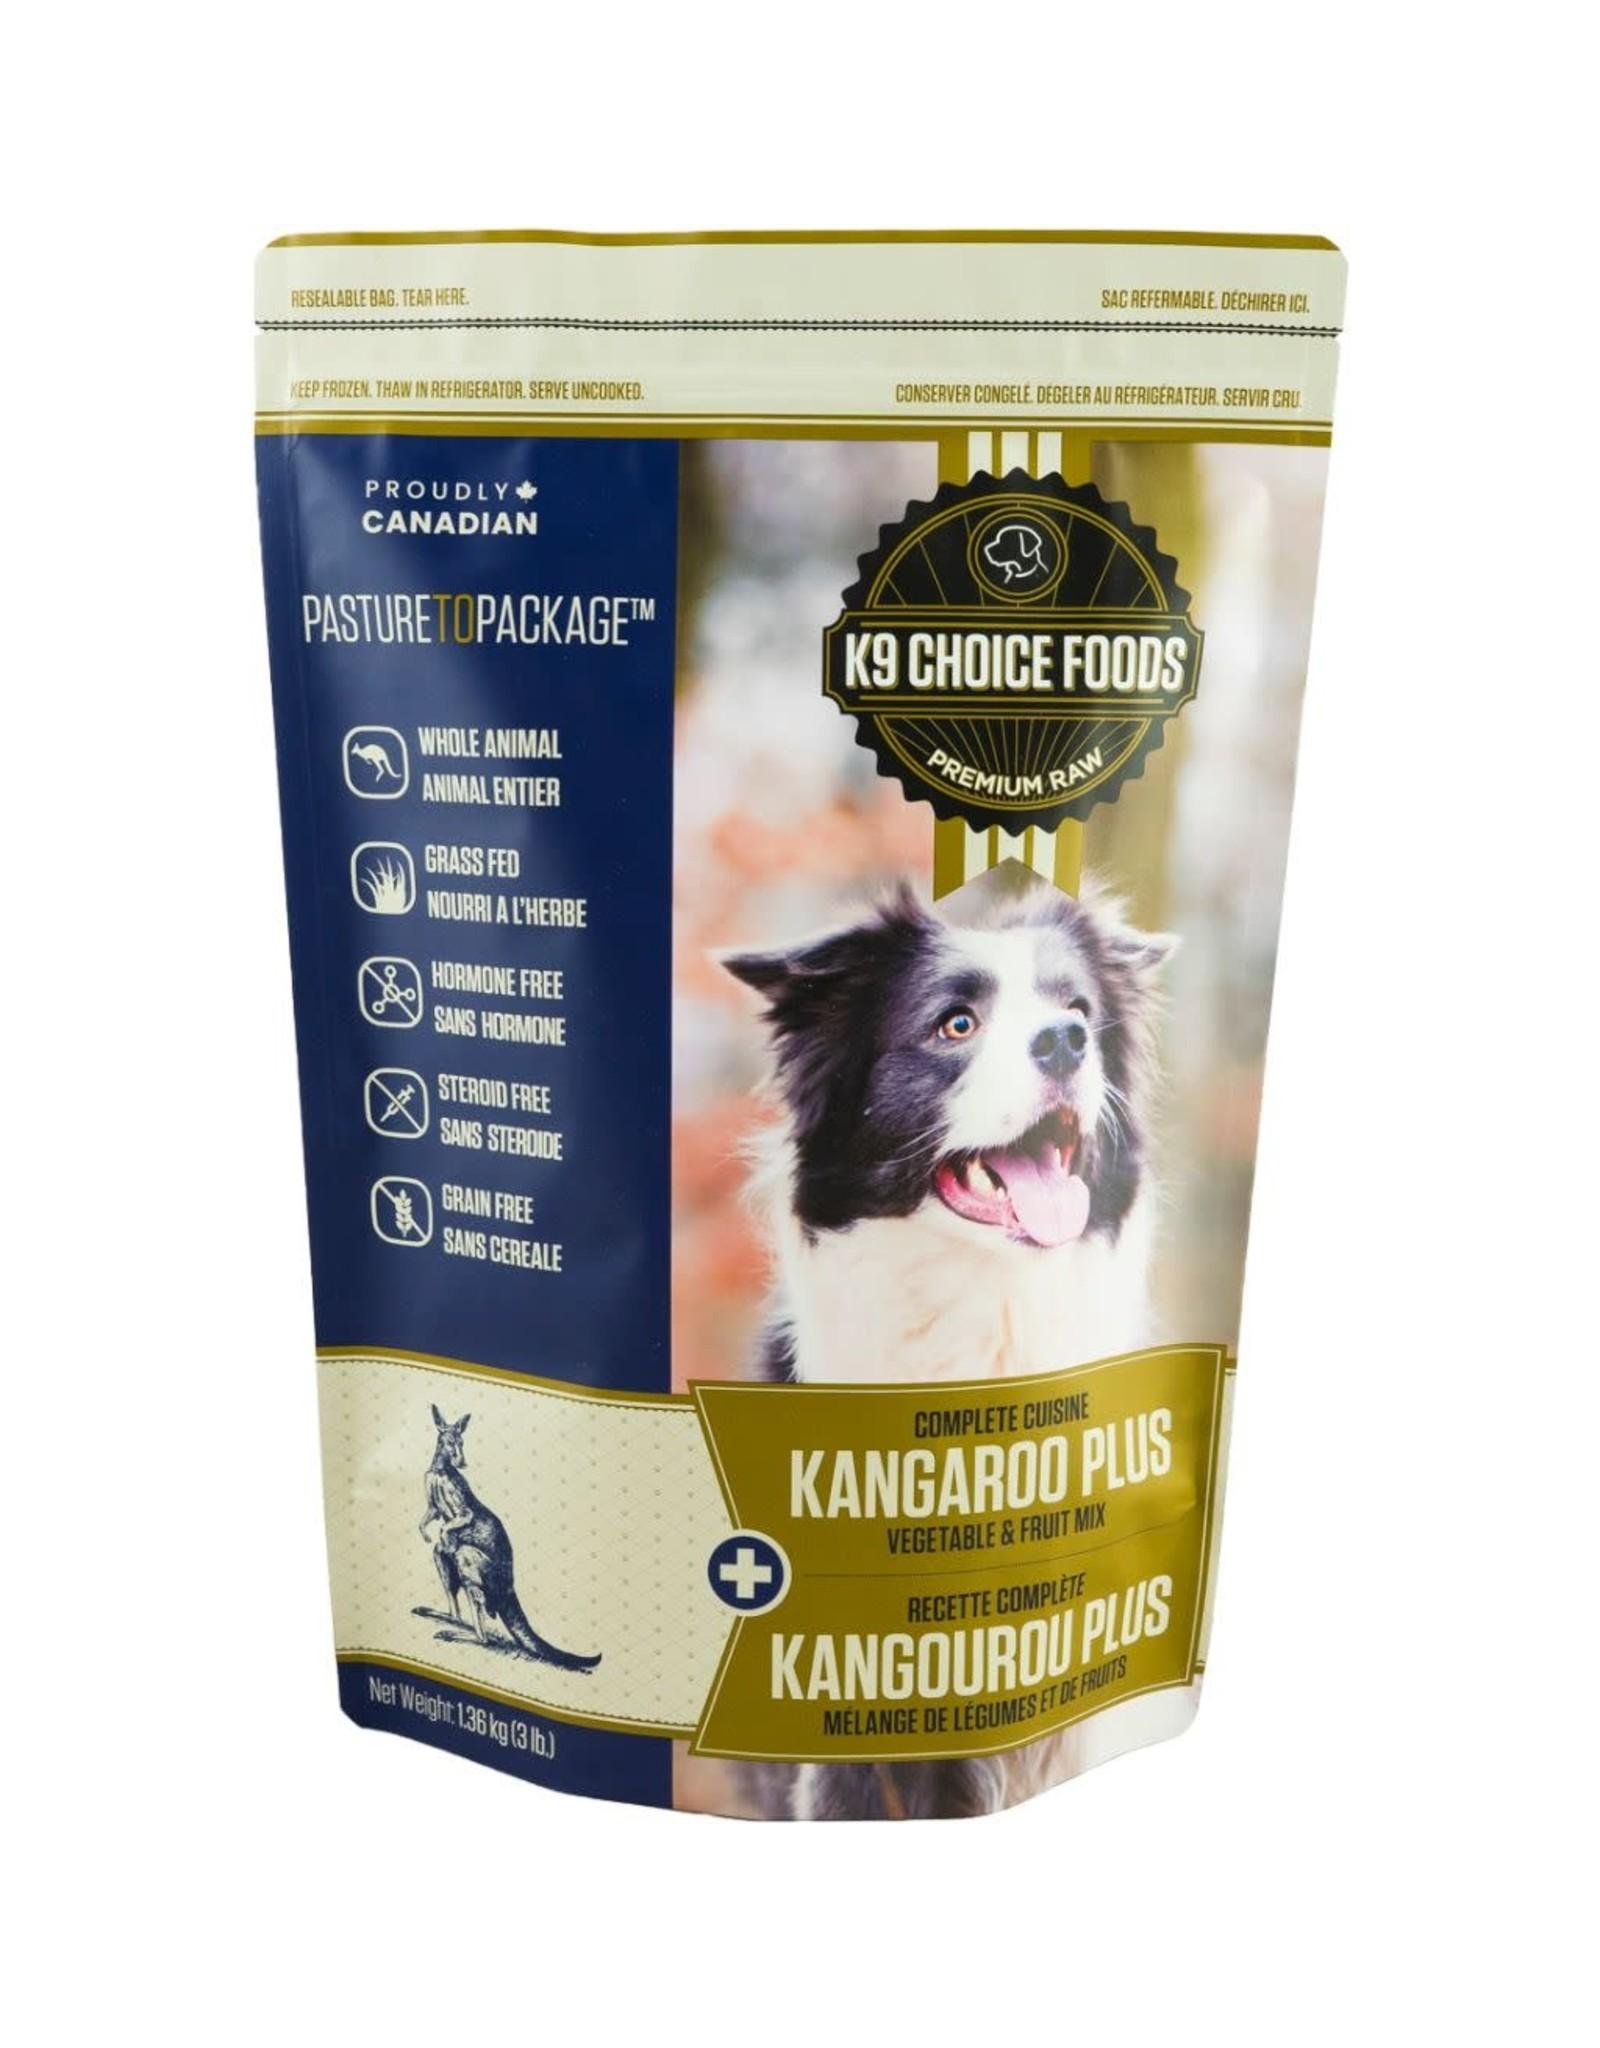 K9 Choice K9 Choice Frozen - Complete Cuisine Kangaroo Plus